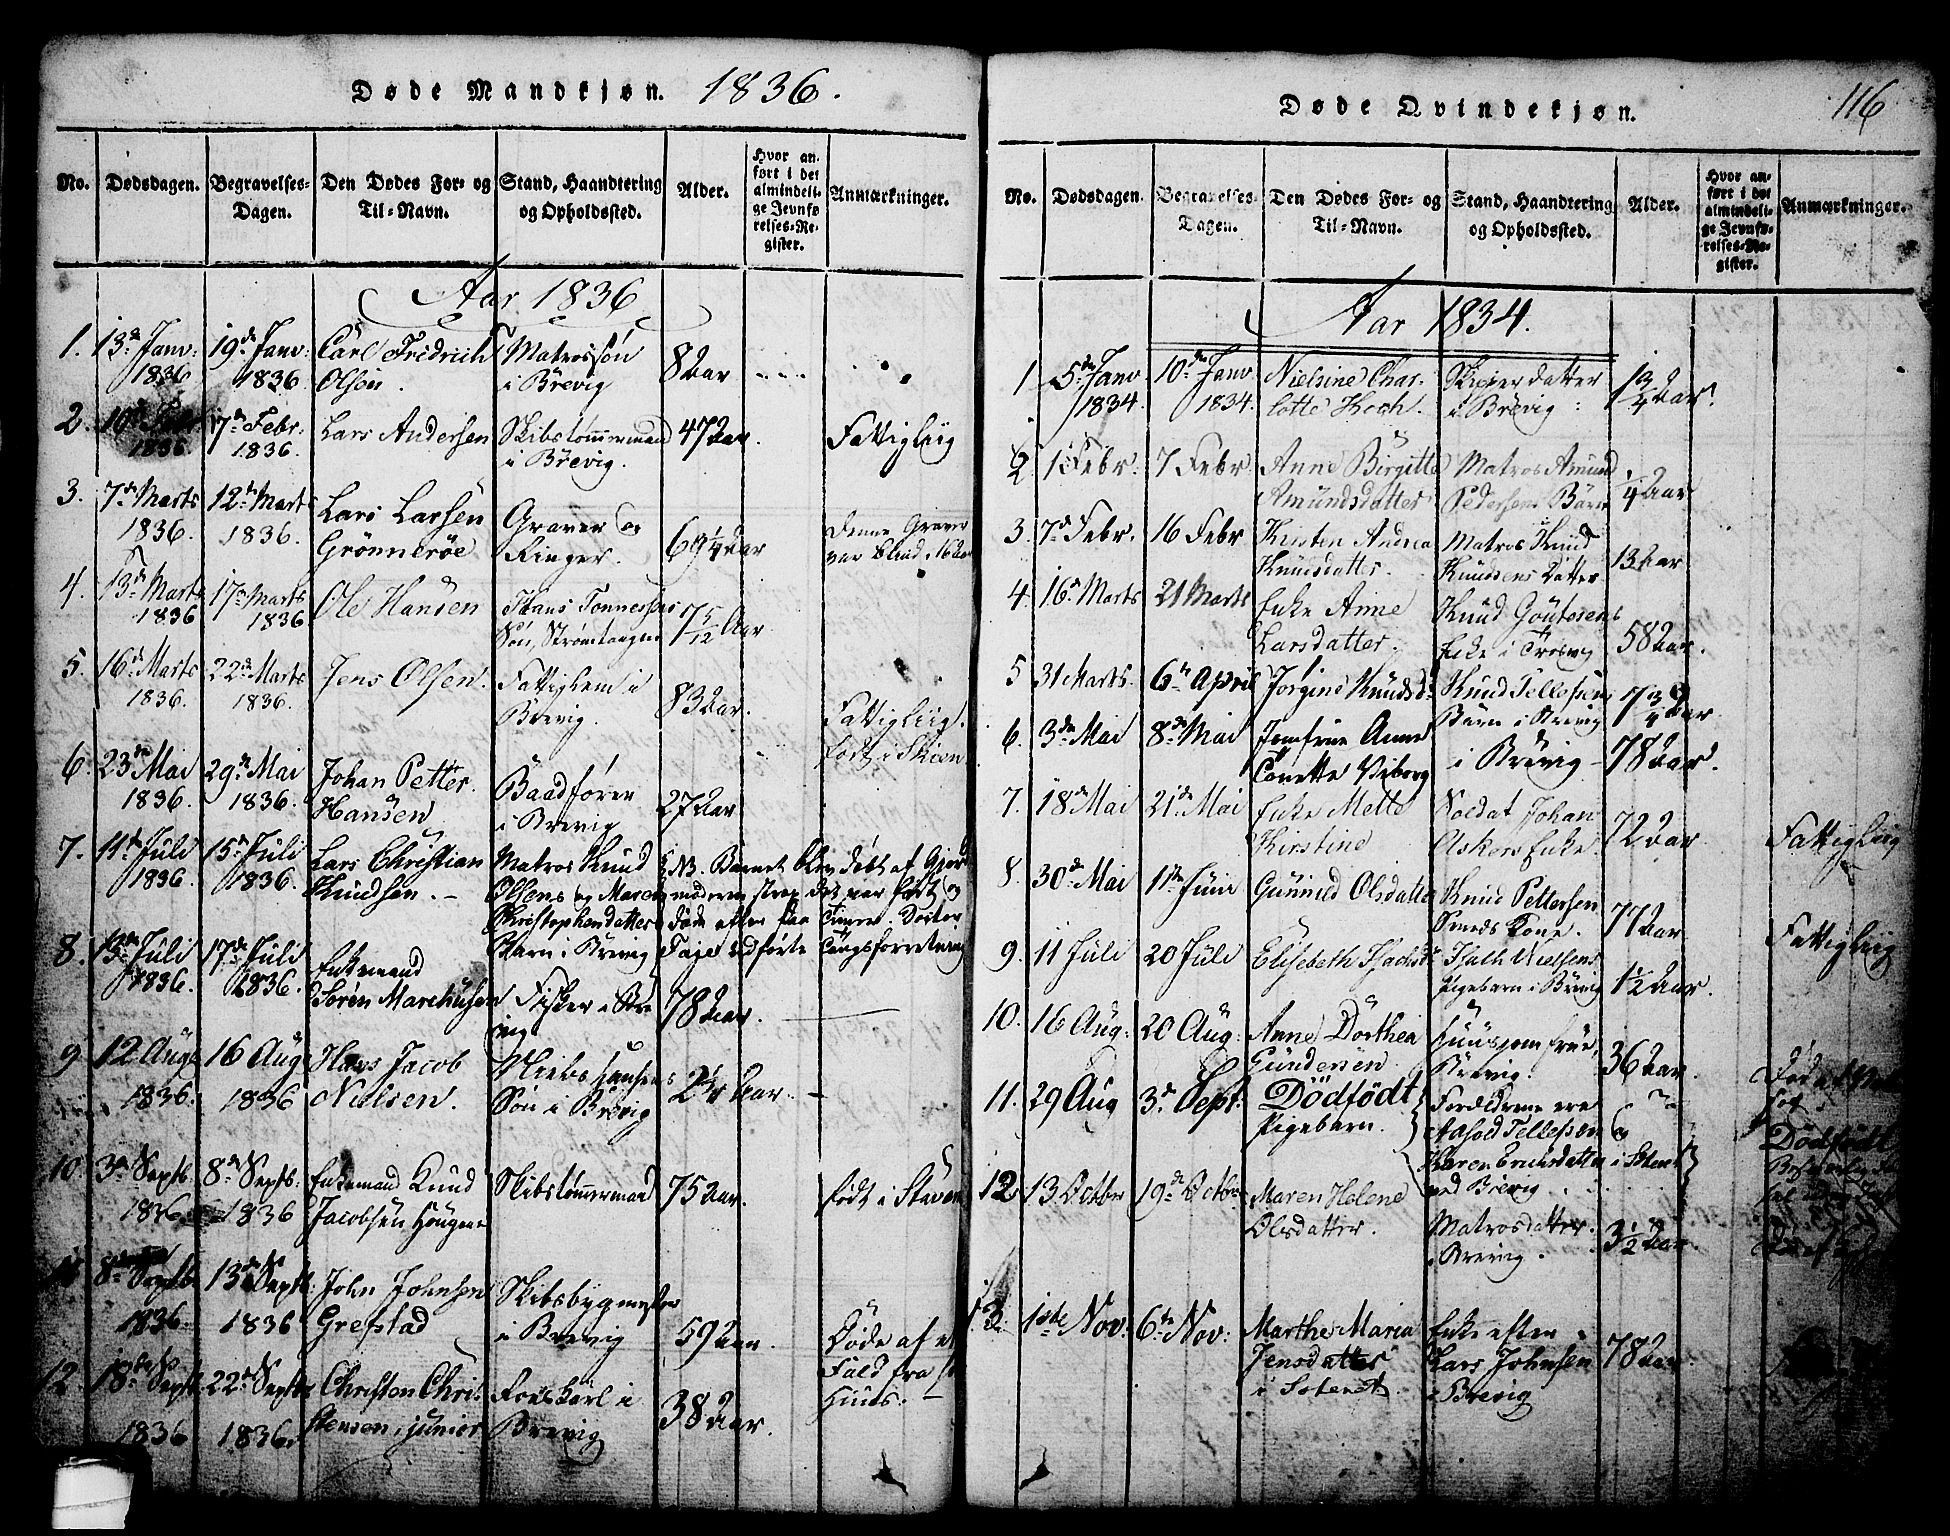 SAKO, Brevik kirkebøker, G/Ga/L0001: Klokkerbok nr. 1, 1814-1845, s. 116